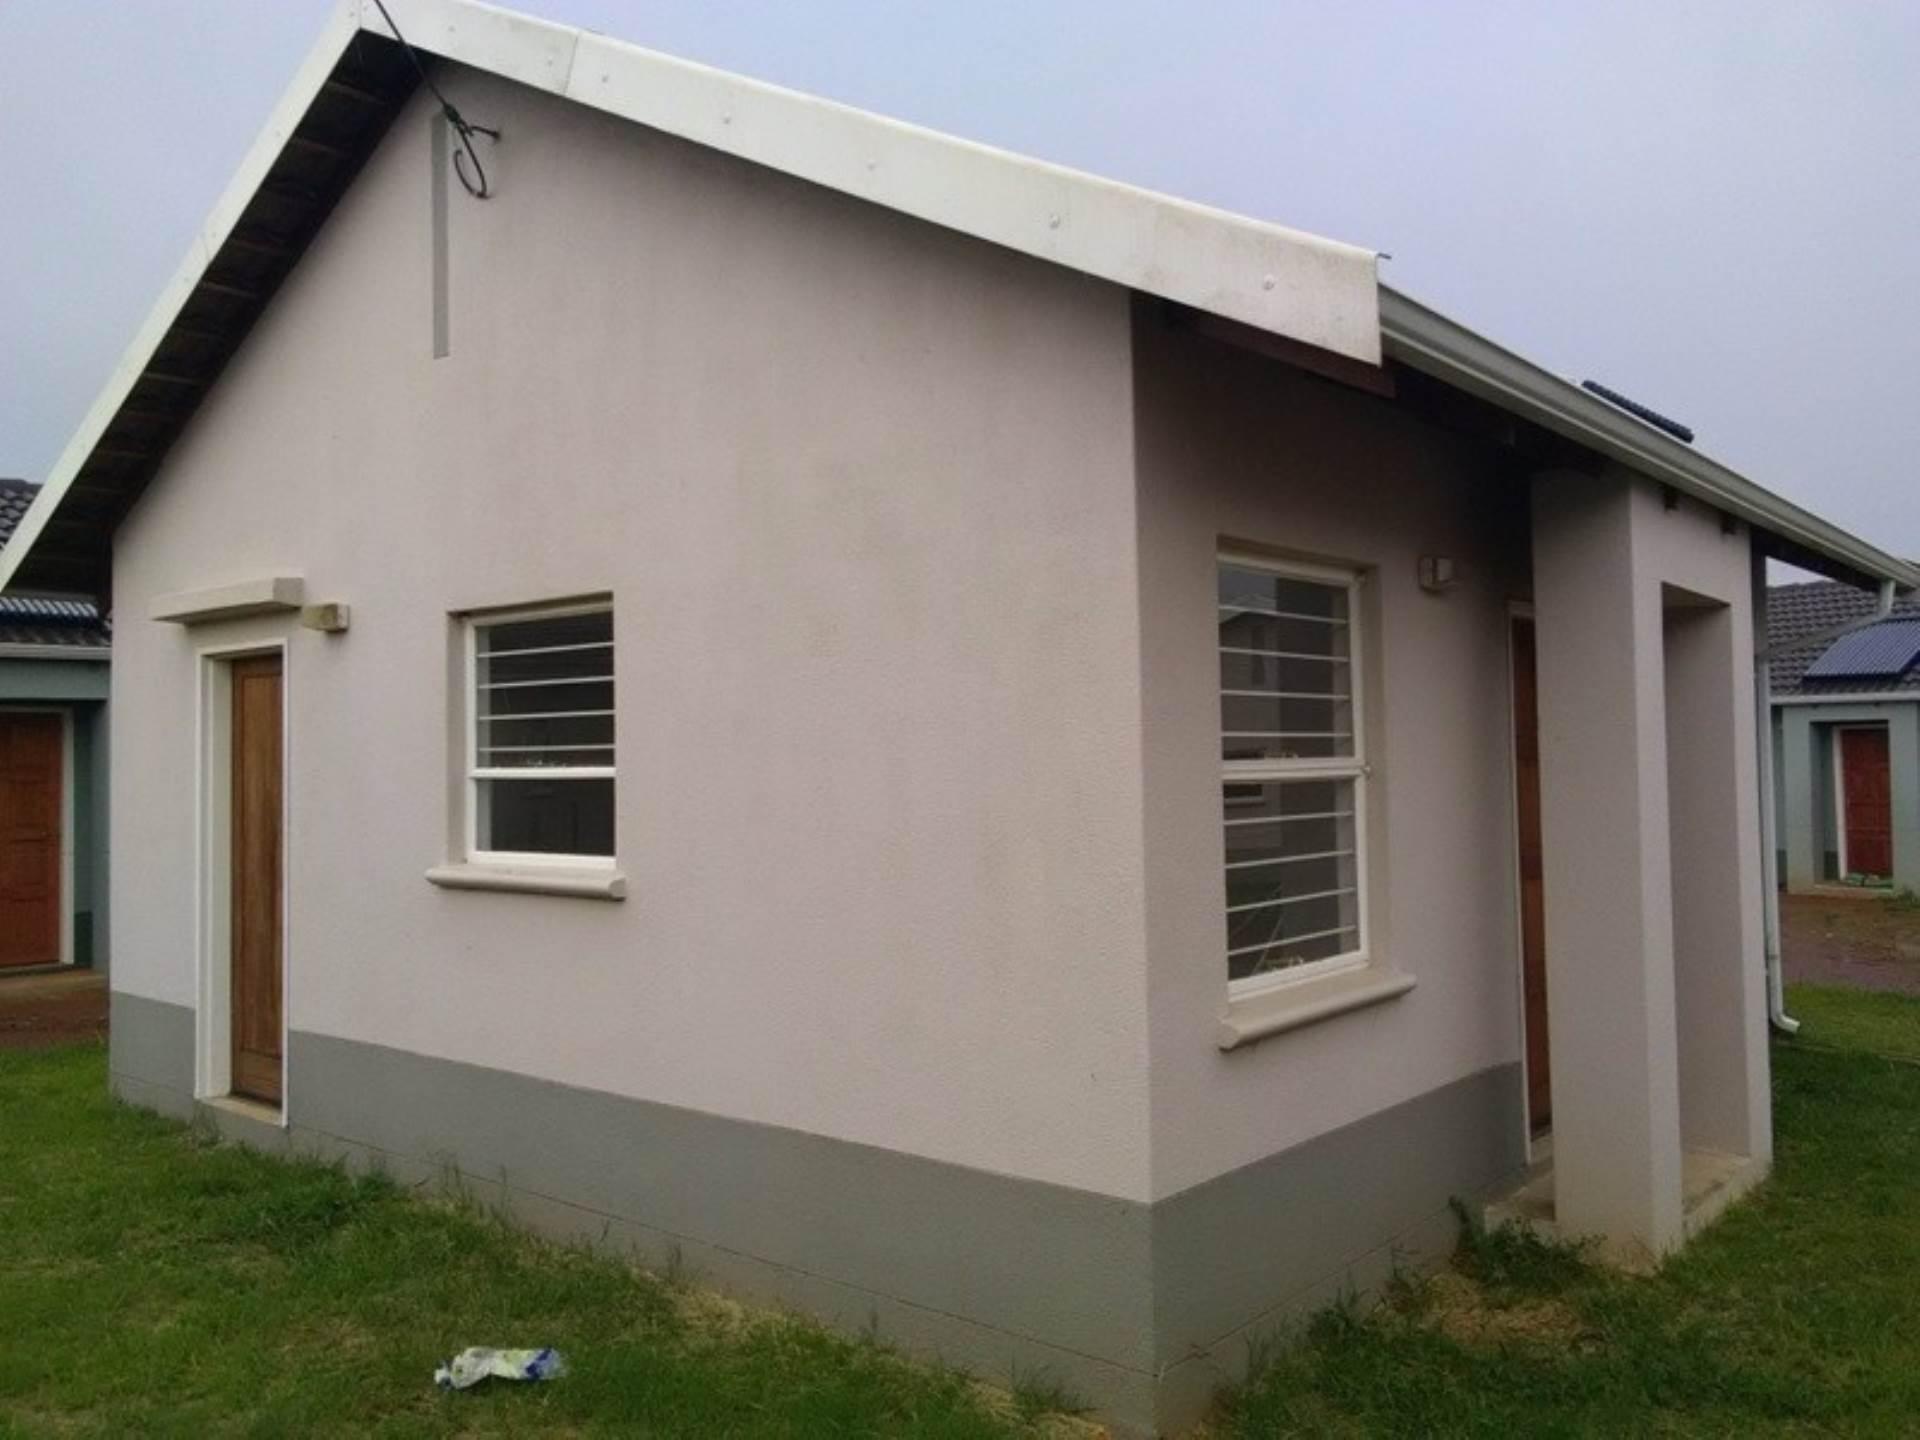 2 BedroomHouse For Sale In Beverley Hills